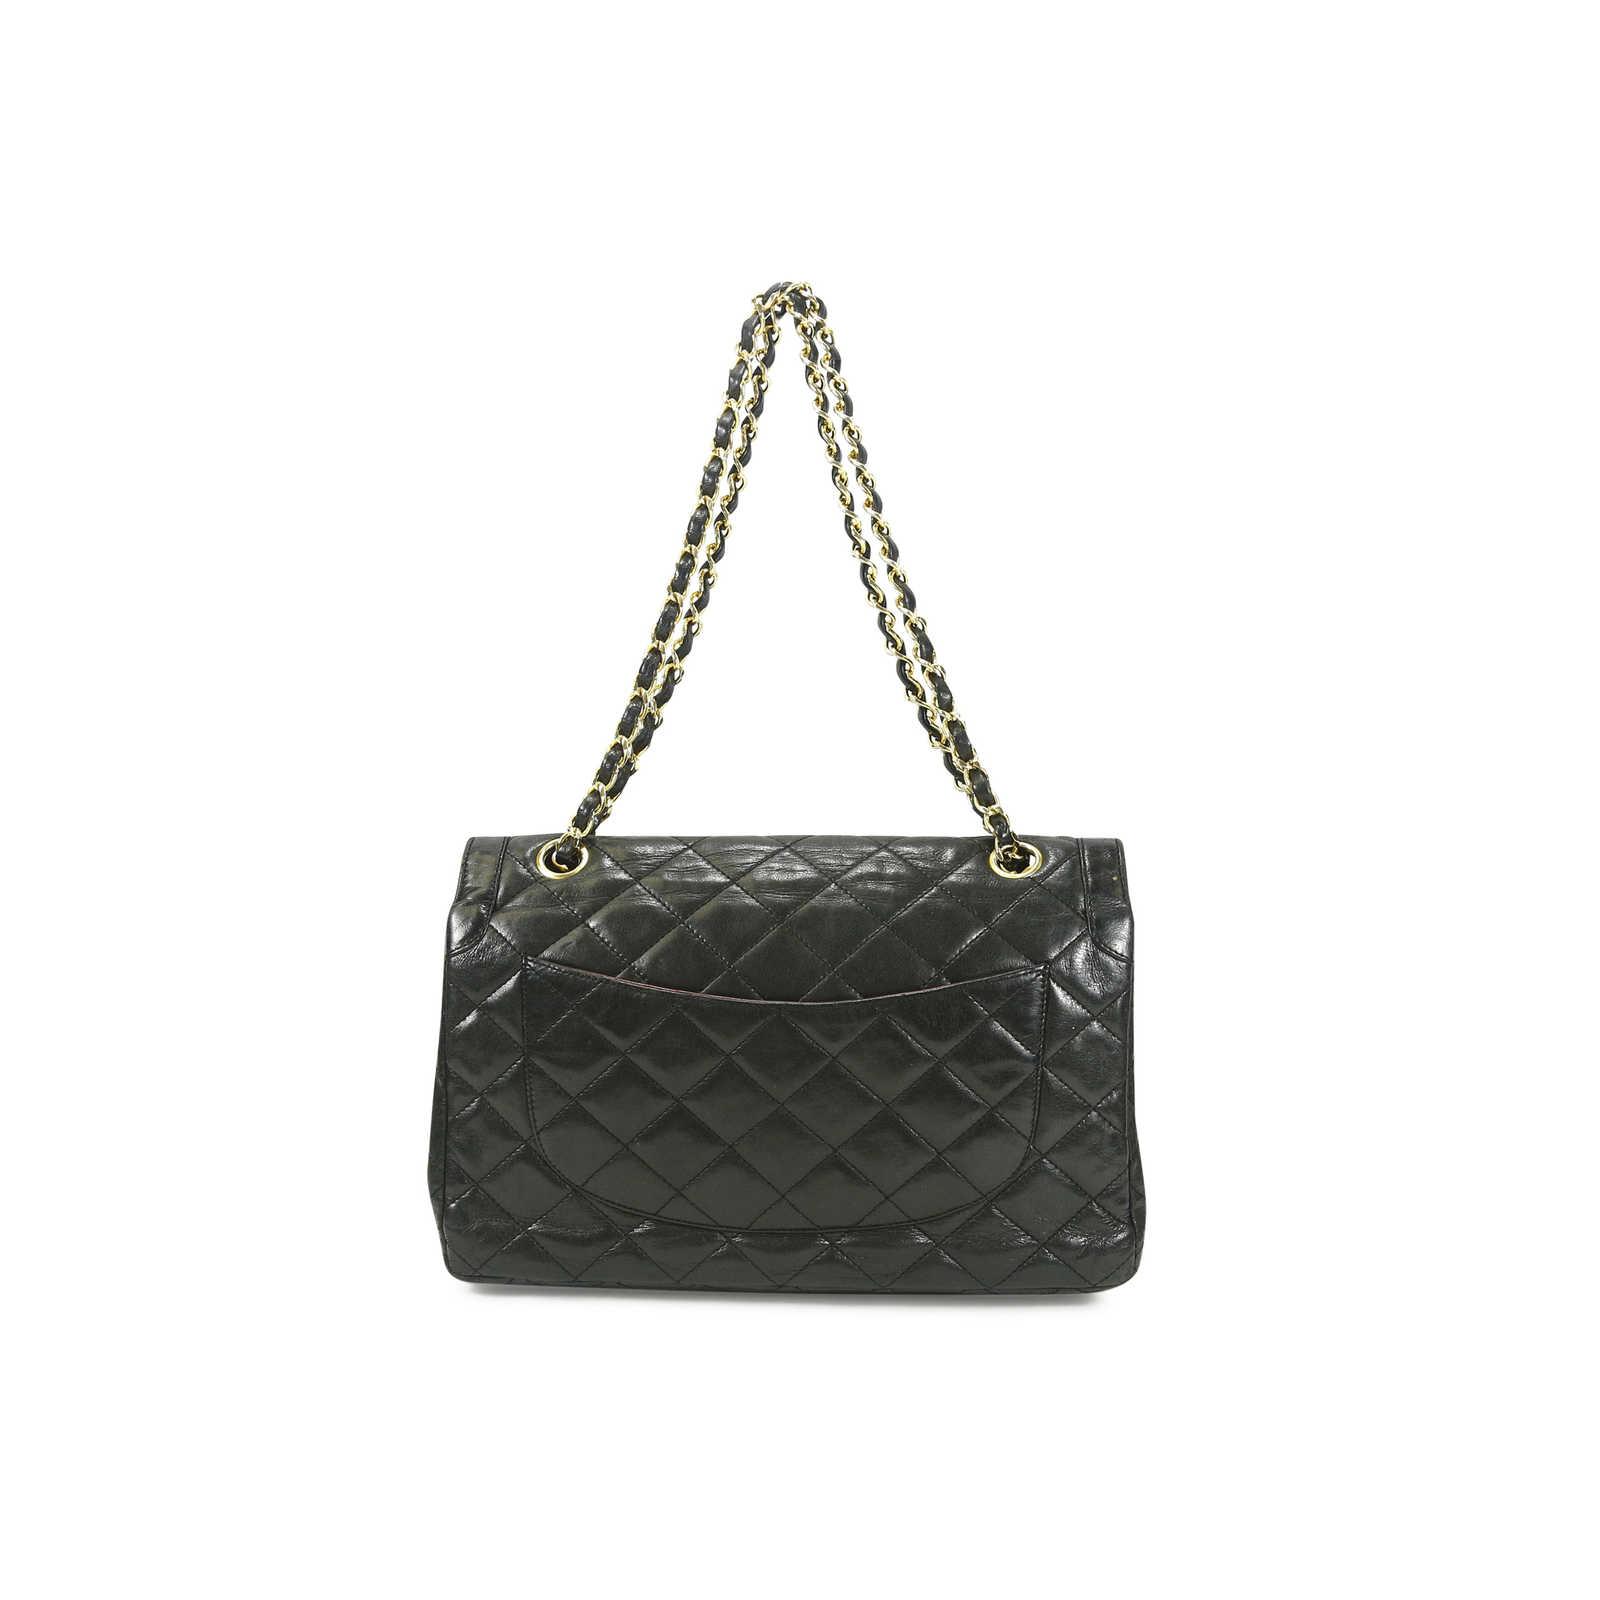 Chanel Väskor Vintage : Second hand chanel vintage classic flap style bag the